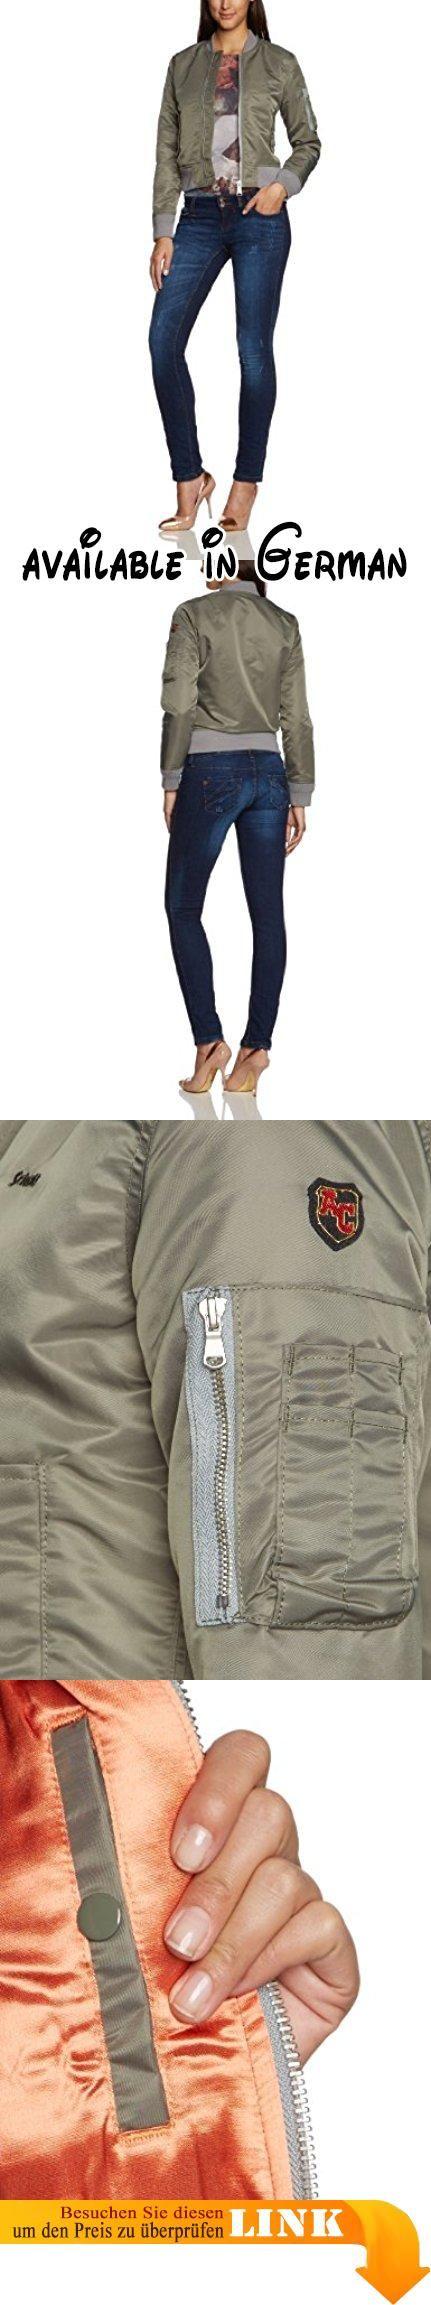 Schott NYC Damen Blouson Jacke JKTACW, Gr. 42 (Herstellergröße: XL), Grün (khaki 14). Stil: Blouson #Apparel #OUTERWEAR